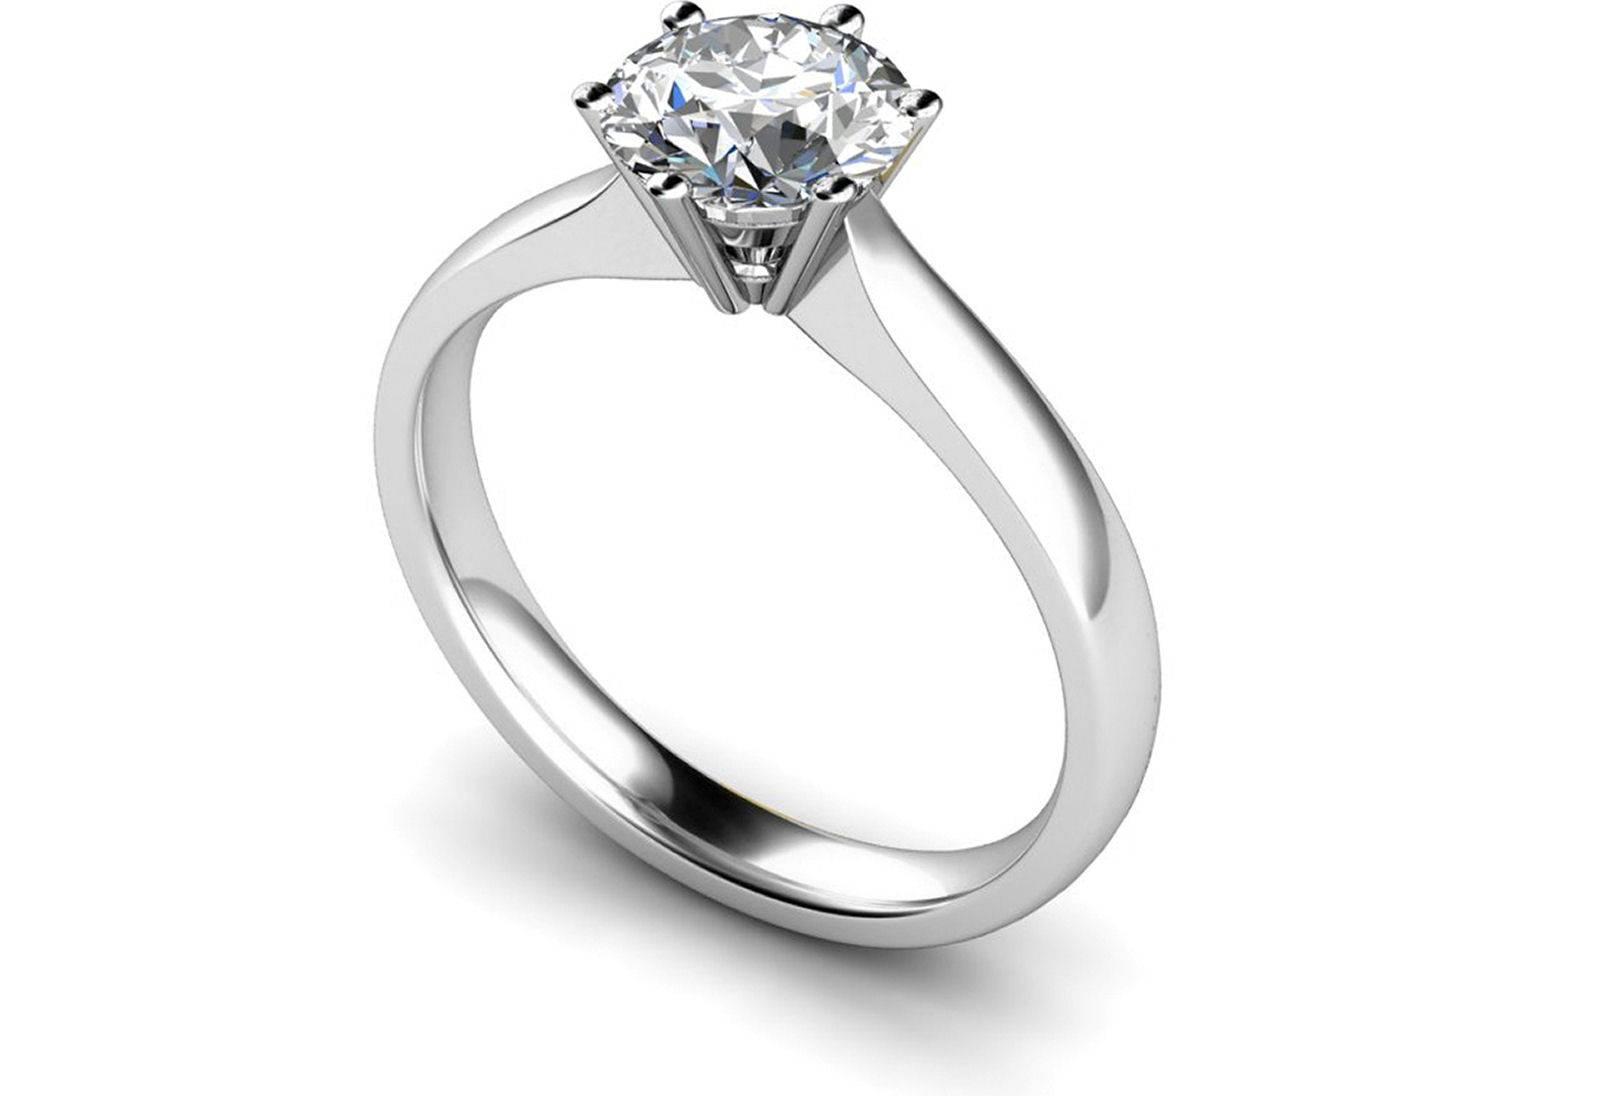 Wedding Rings : Diamond And Wedding Ring Bargain Centre Diamond For Diamond Wedding Rings (View 14 of 15)